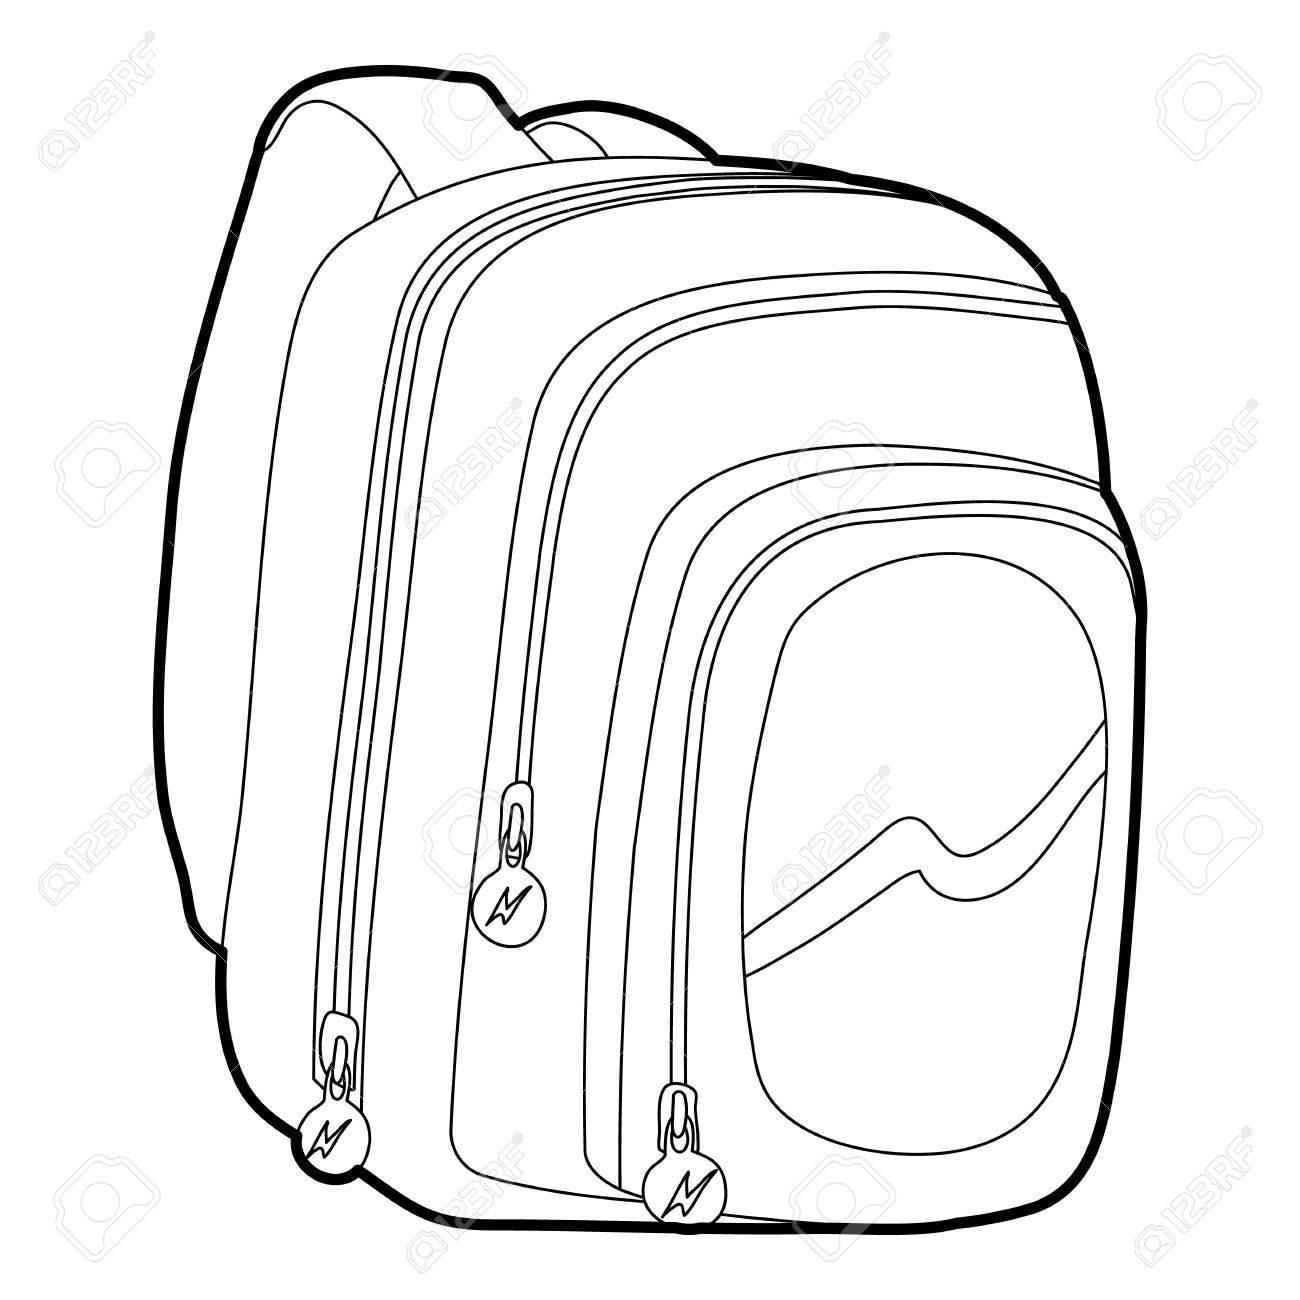 1300x1300 Kids School Bag Icon Outline Royalty Free Cliparts, Vectors,